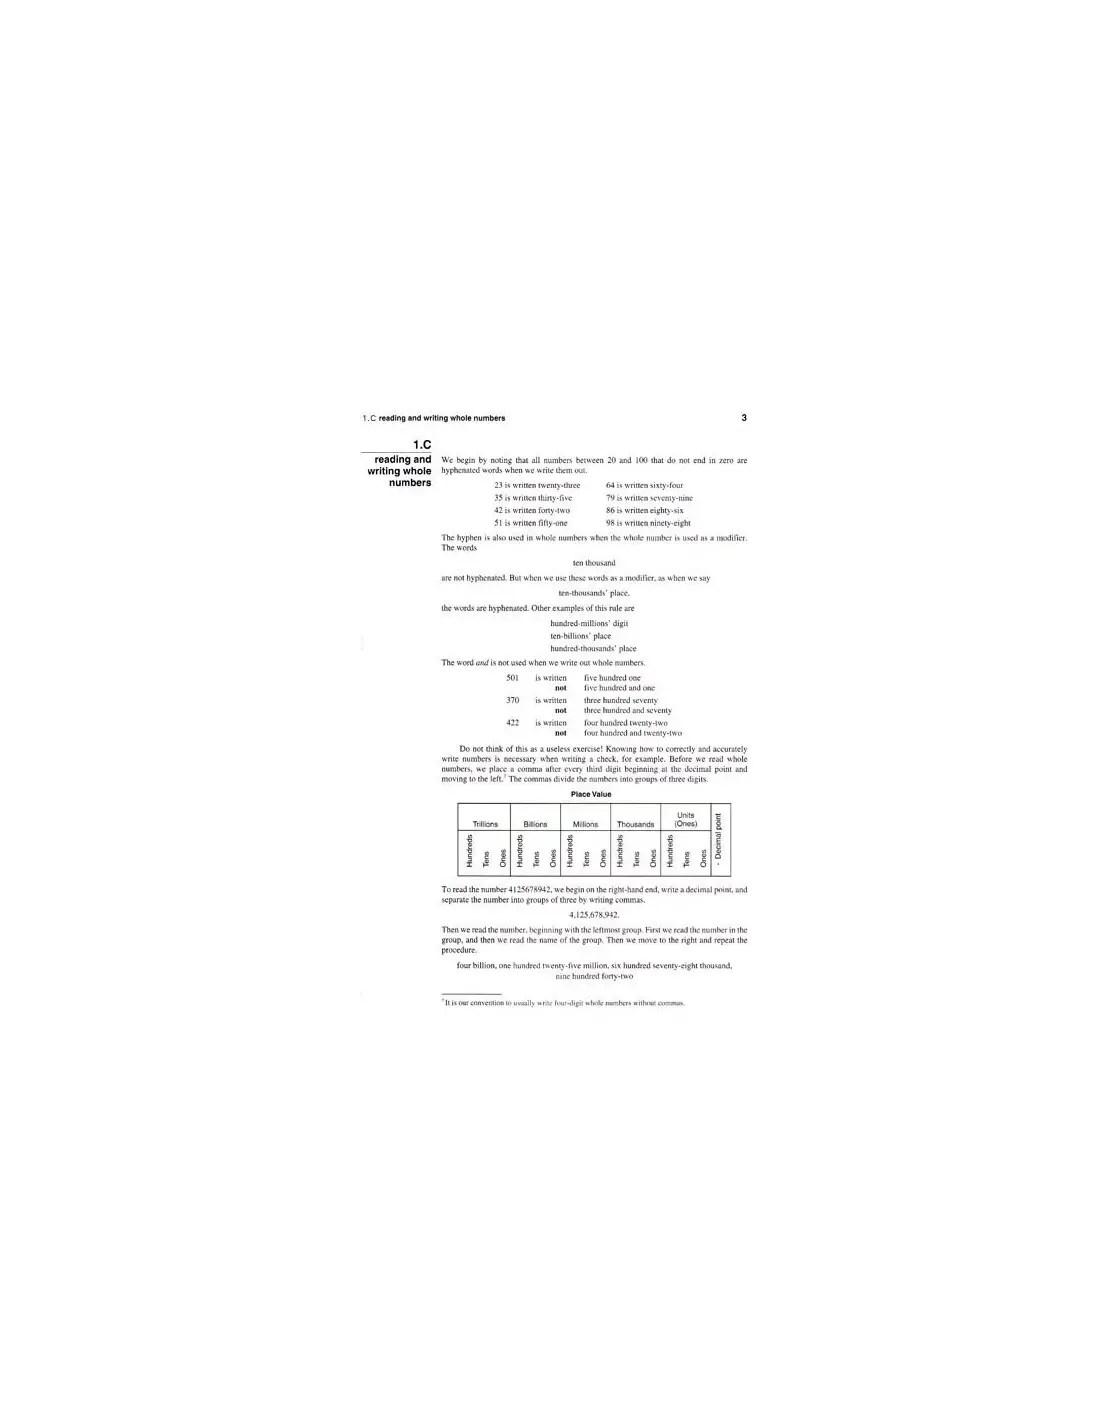 Saxon Algebra 1/2 (3rd edition) Home Study Kit